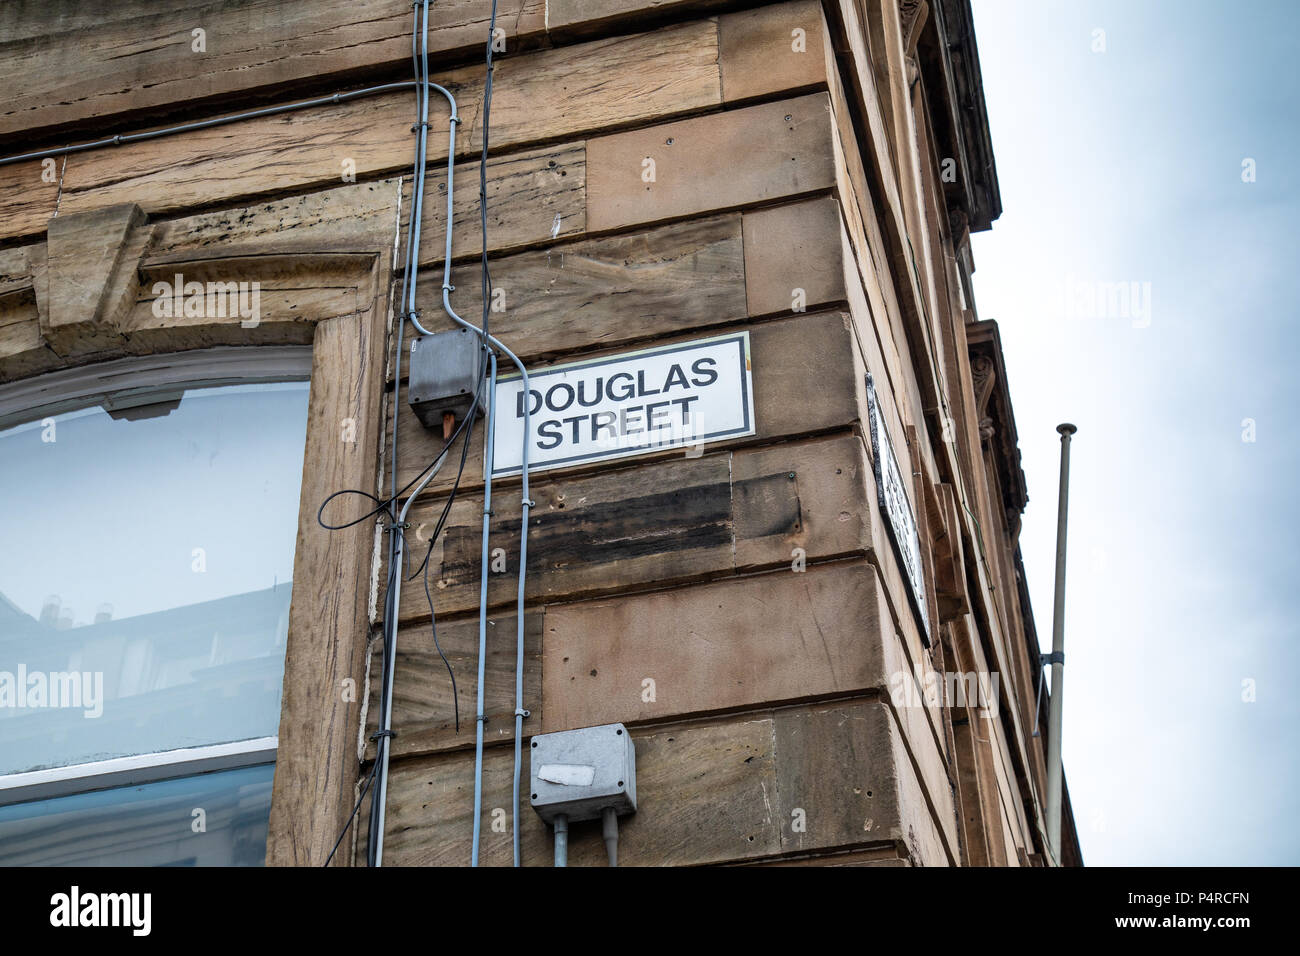 Douglas Street in Glasgow city centre - Stock Image